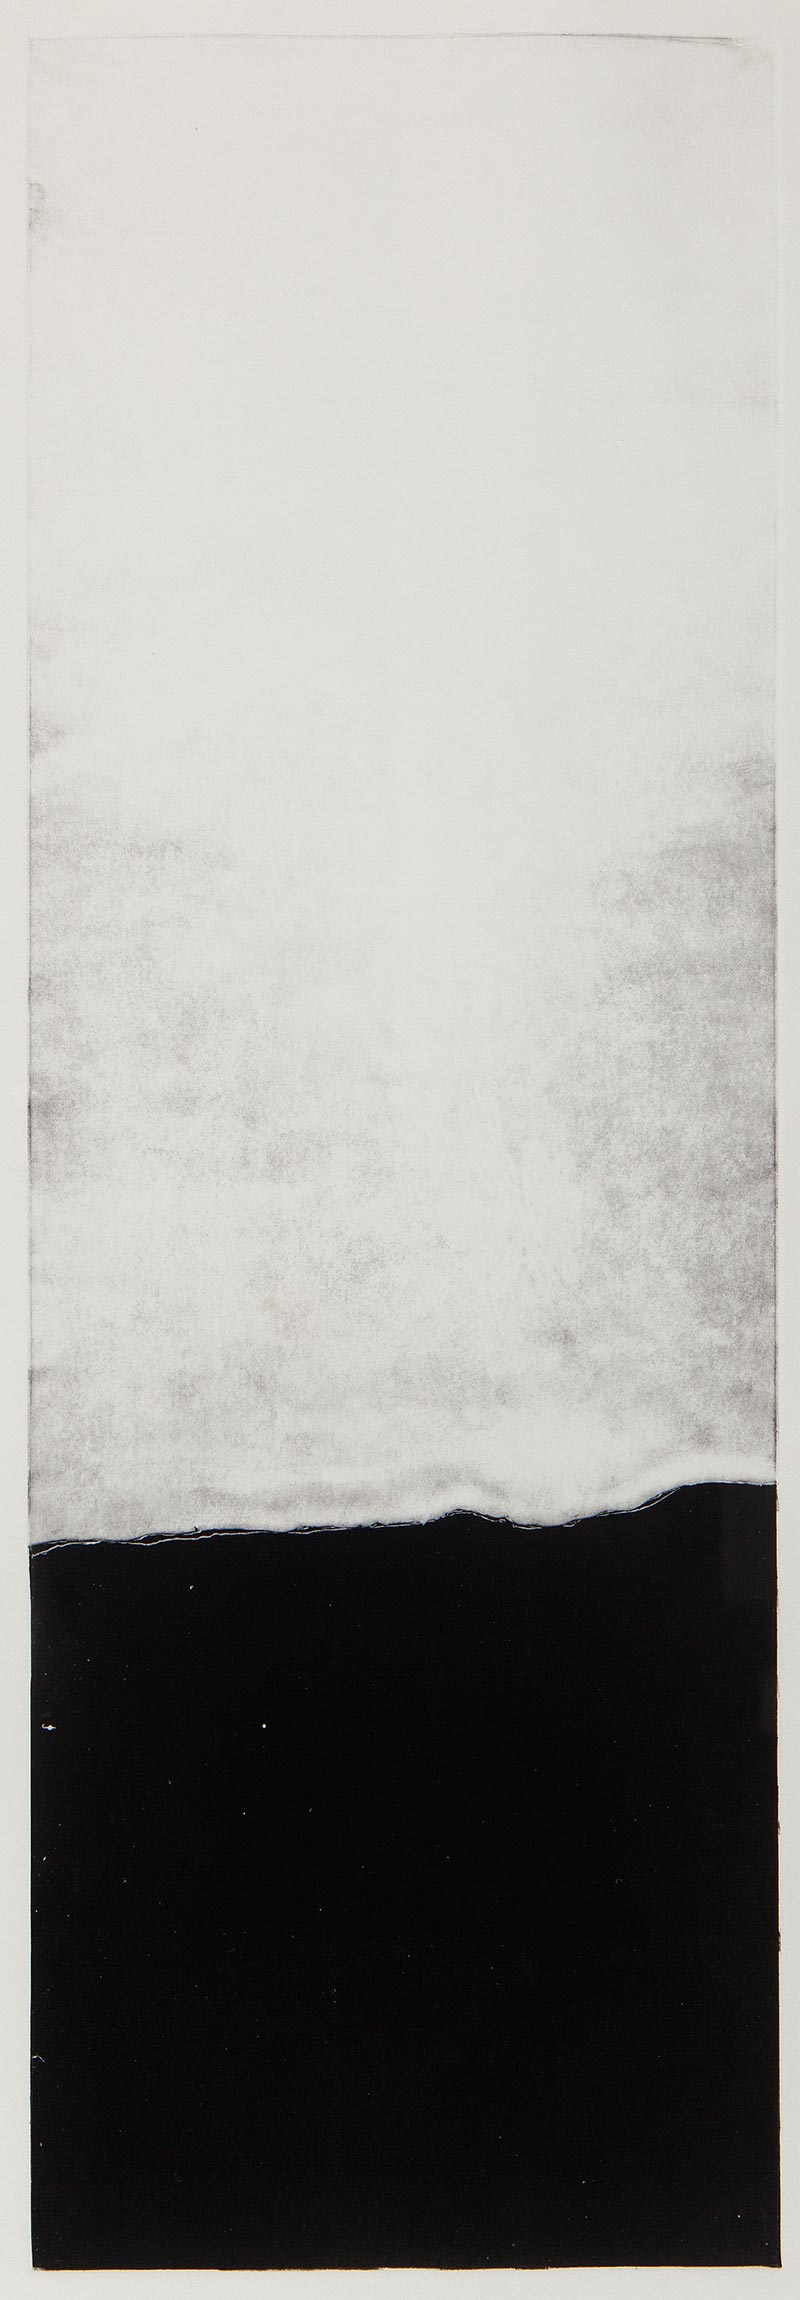 Andrew Tyler - Untitled